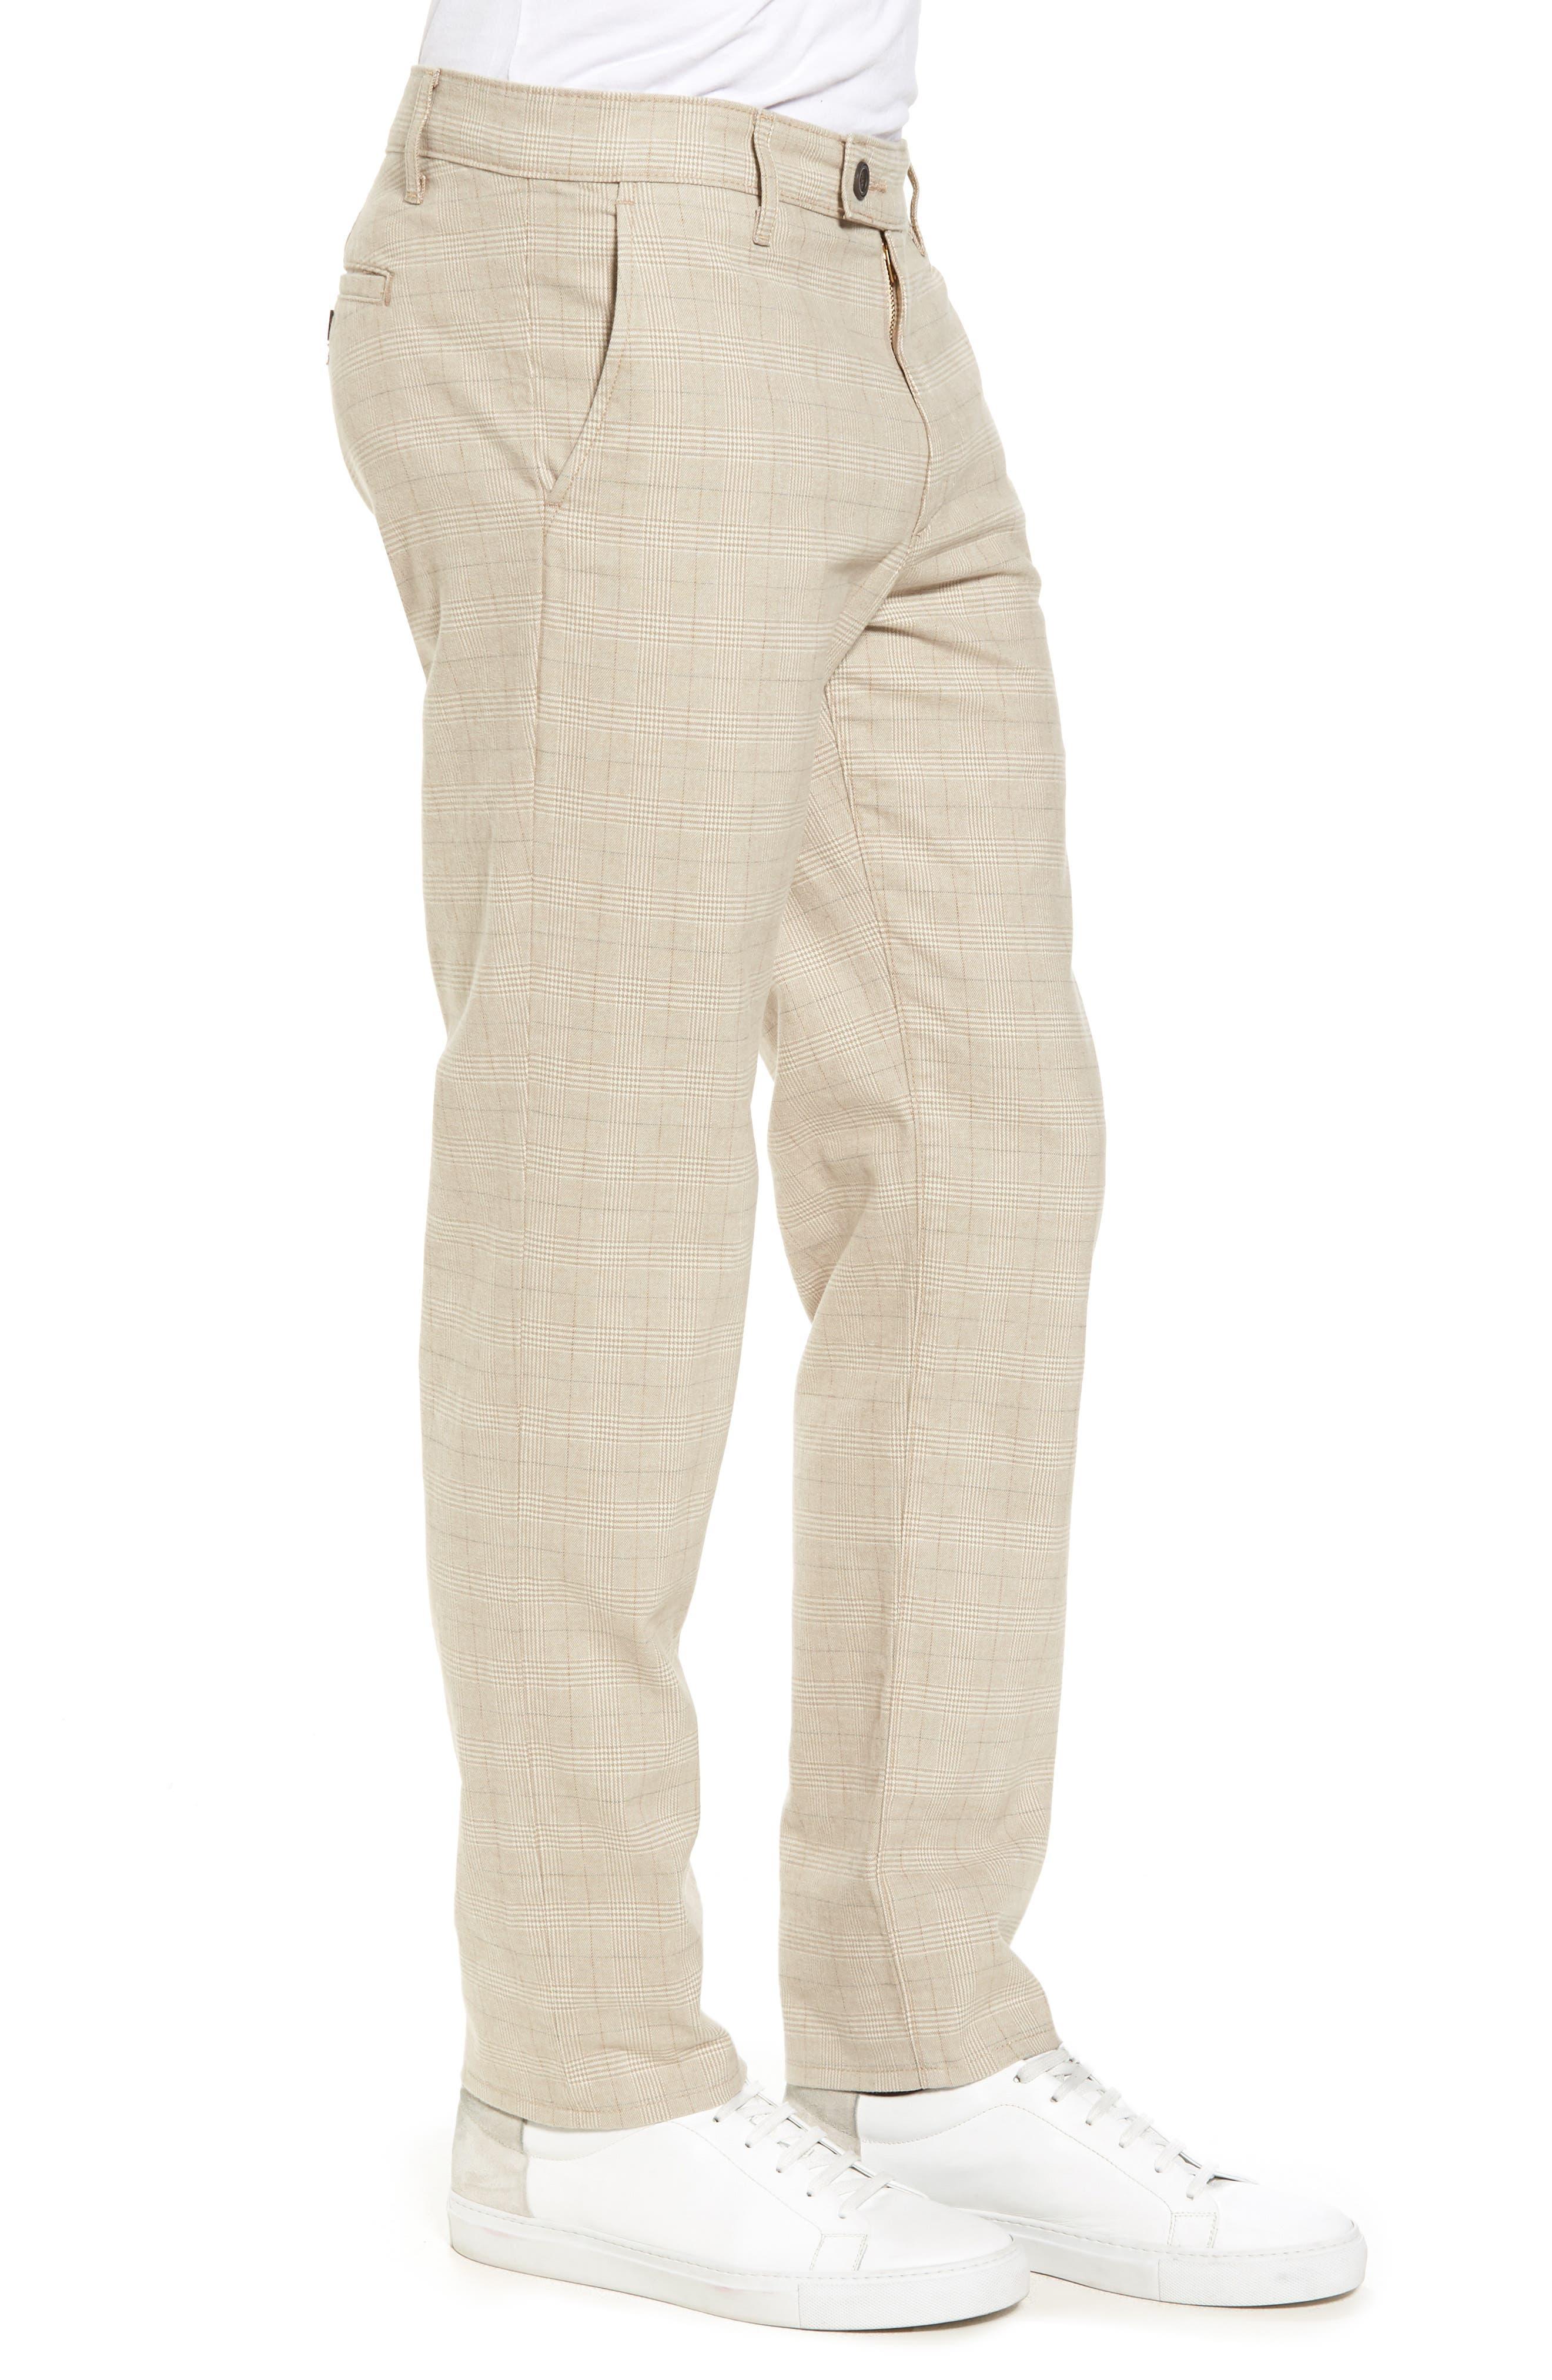 Marshall Slim Fit Pants,                             Alternate thumbnail 8, color,